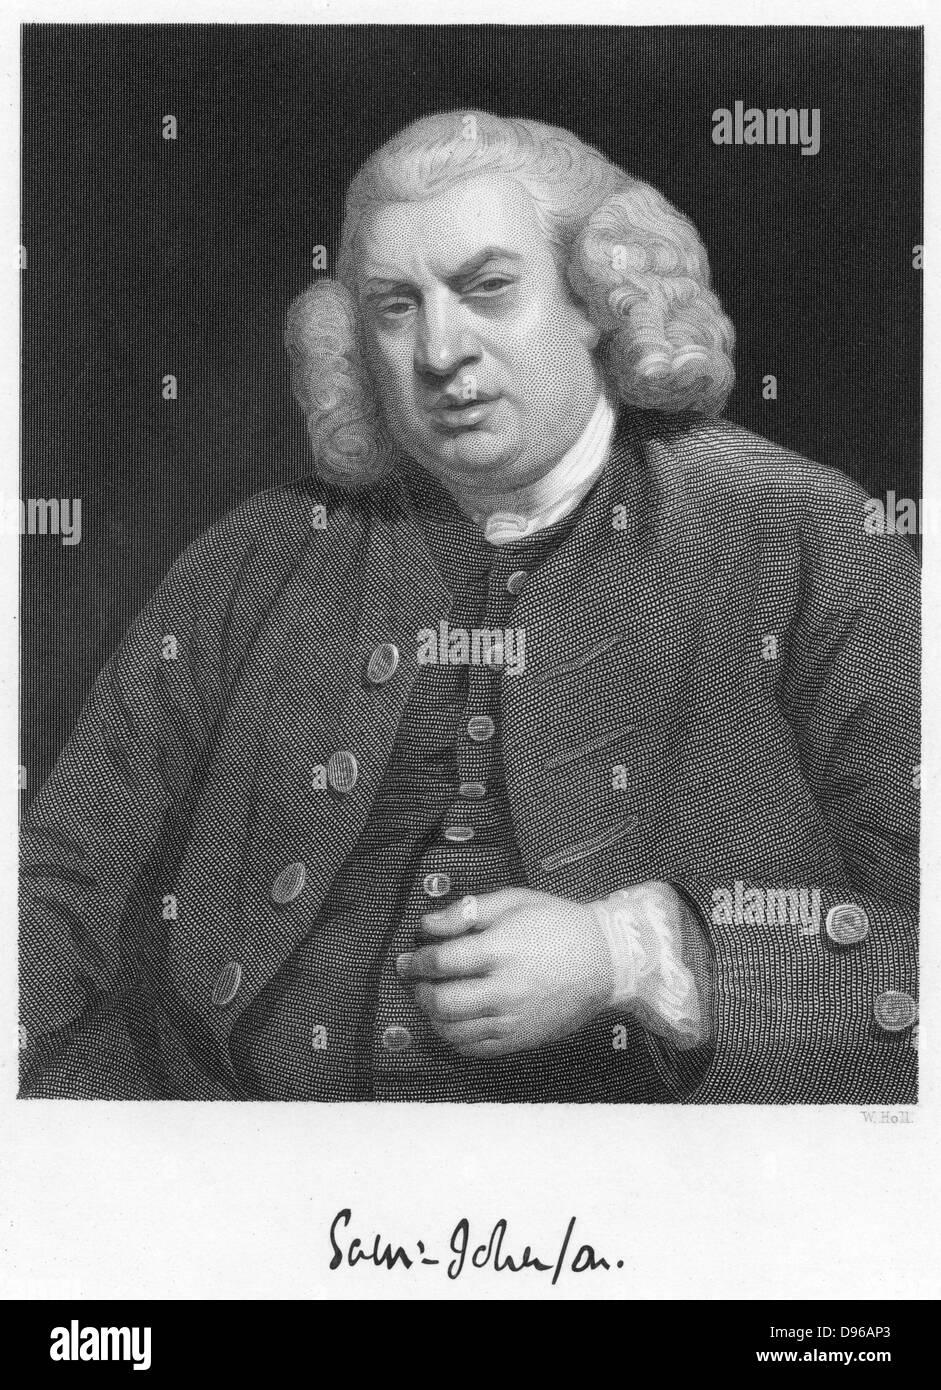 Samuel Johnson (1709-1784)  English author and lexicographer. - Stock Image